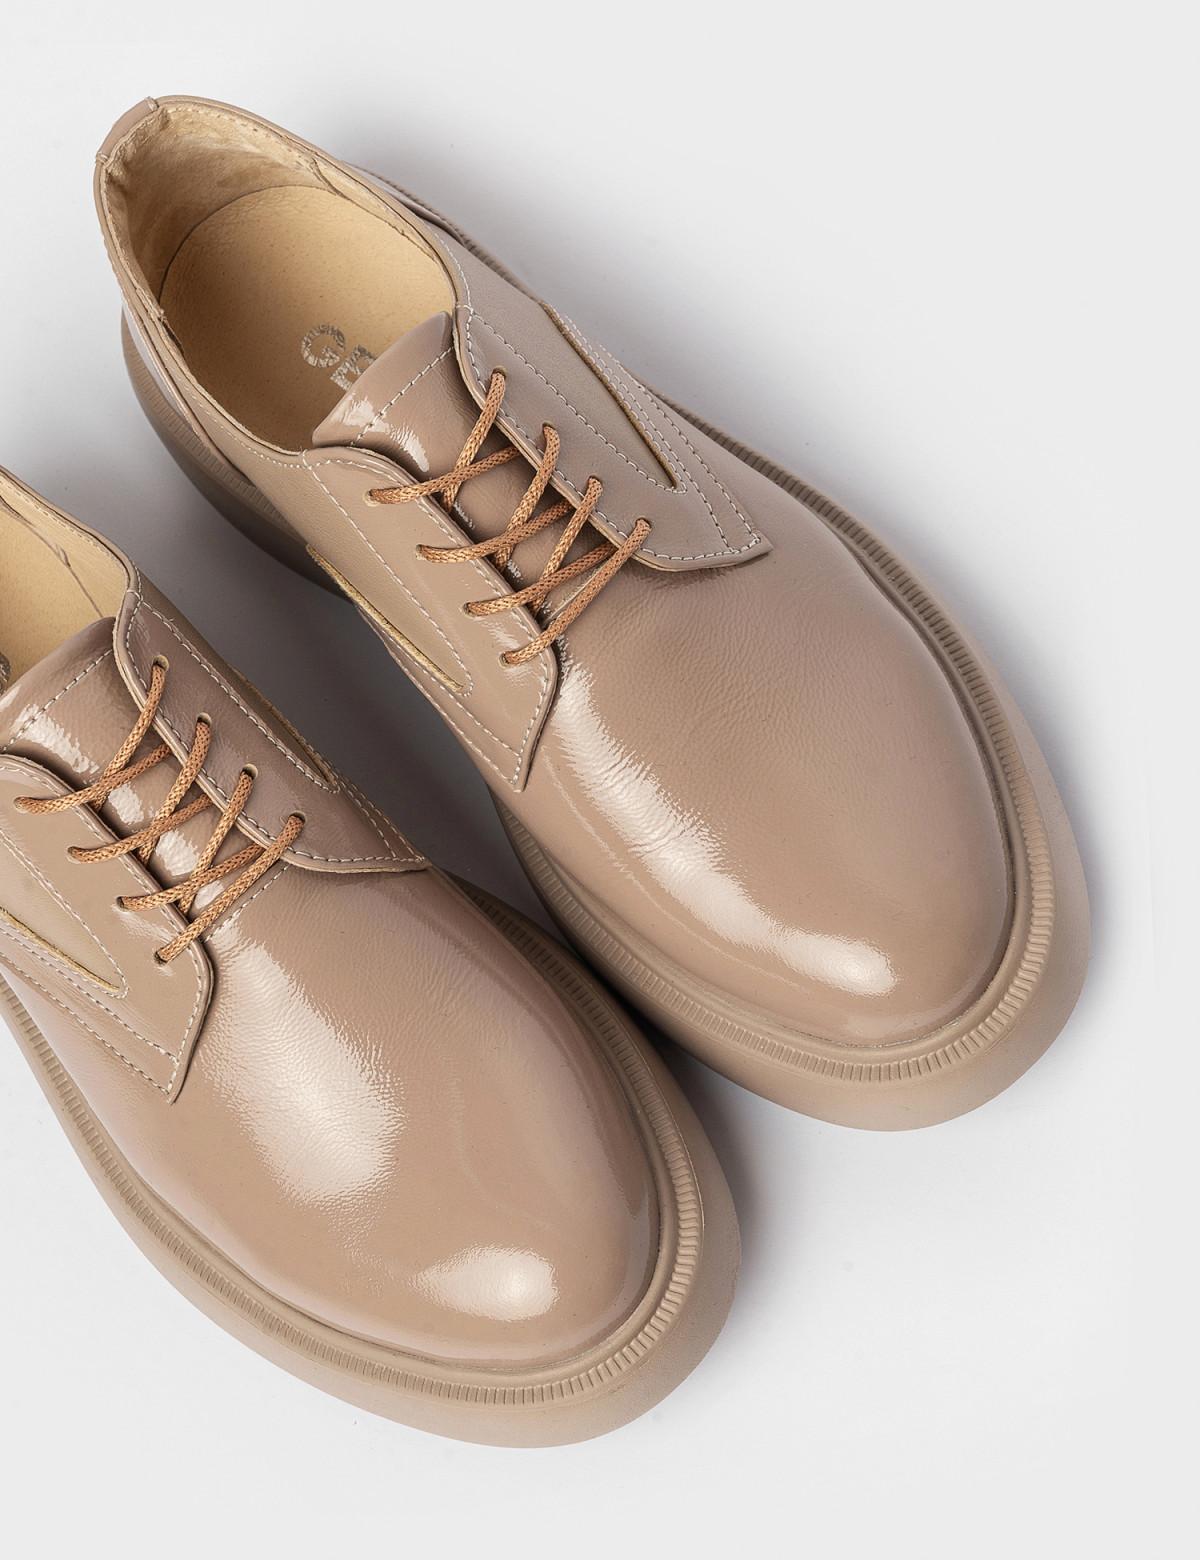 Туфлі бежеві. Натуральна шкіра3